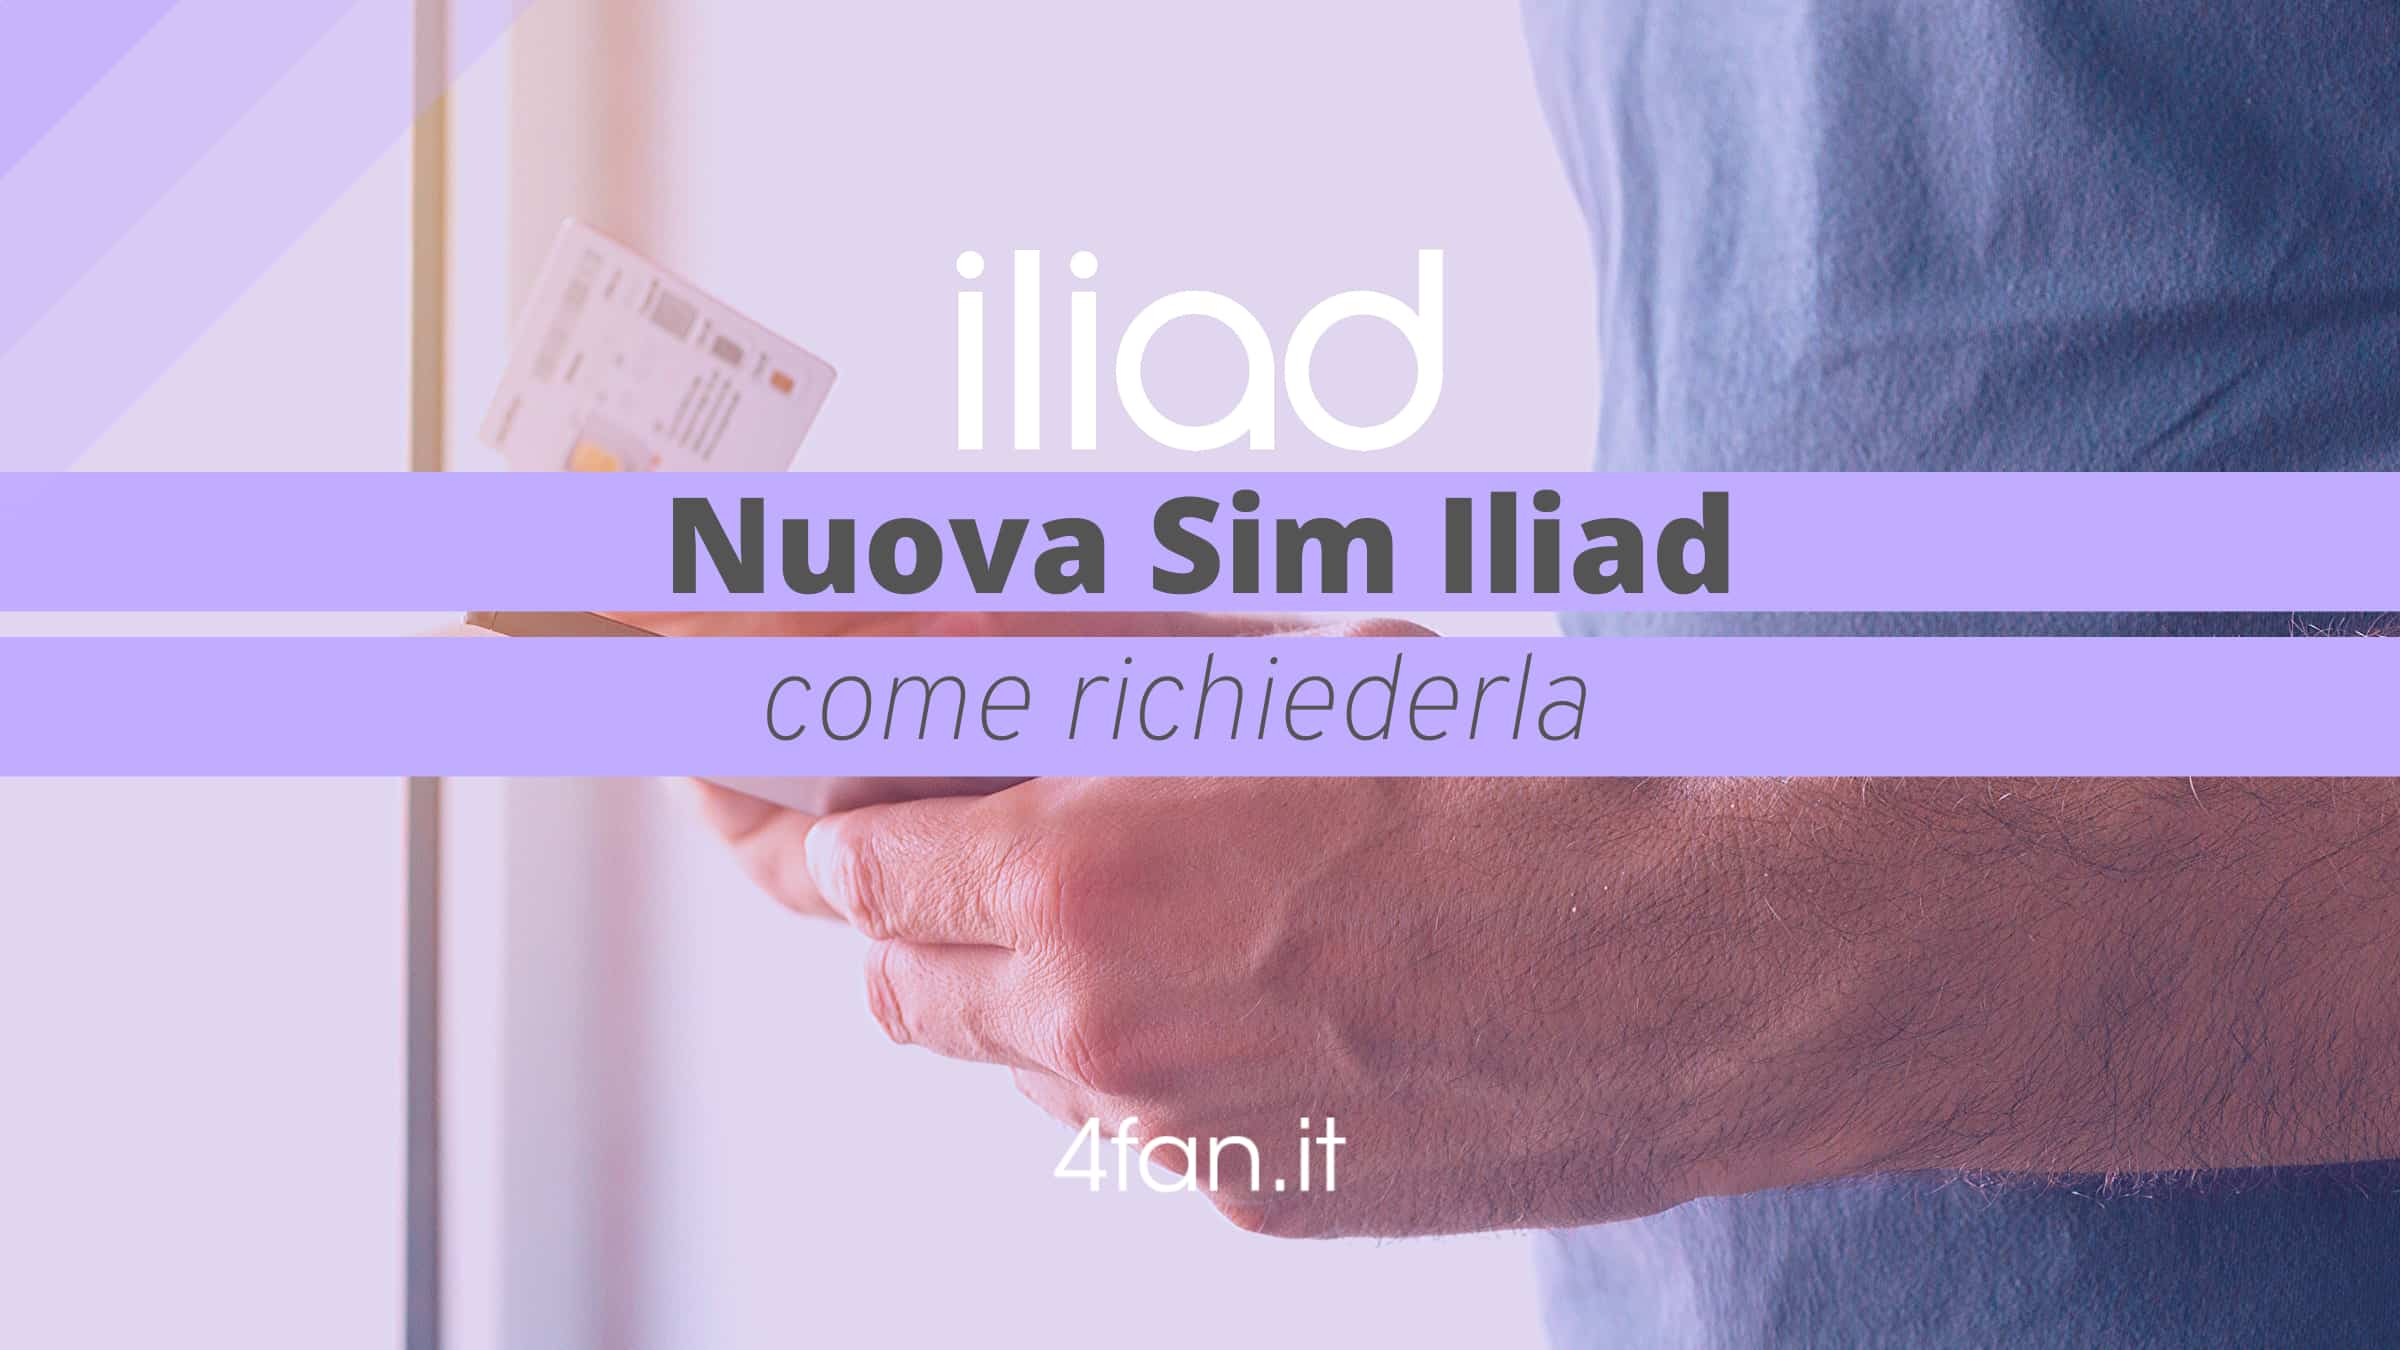 Nuova Sim Iliad